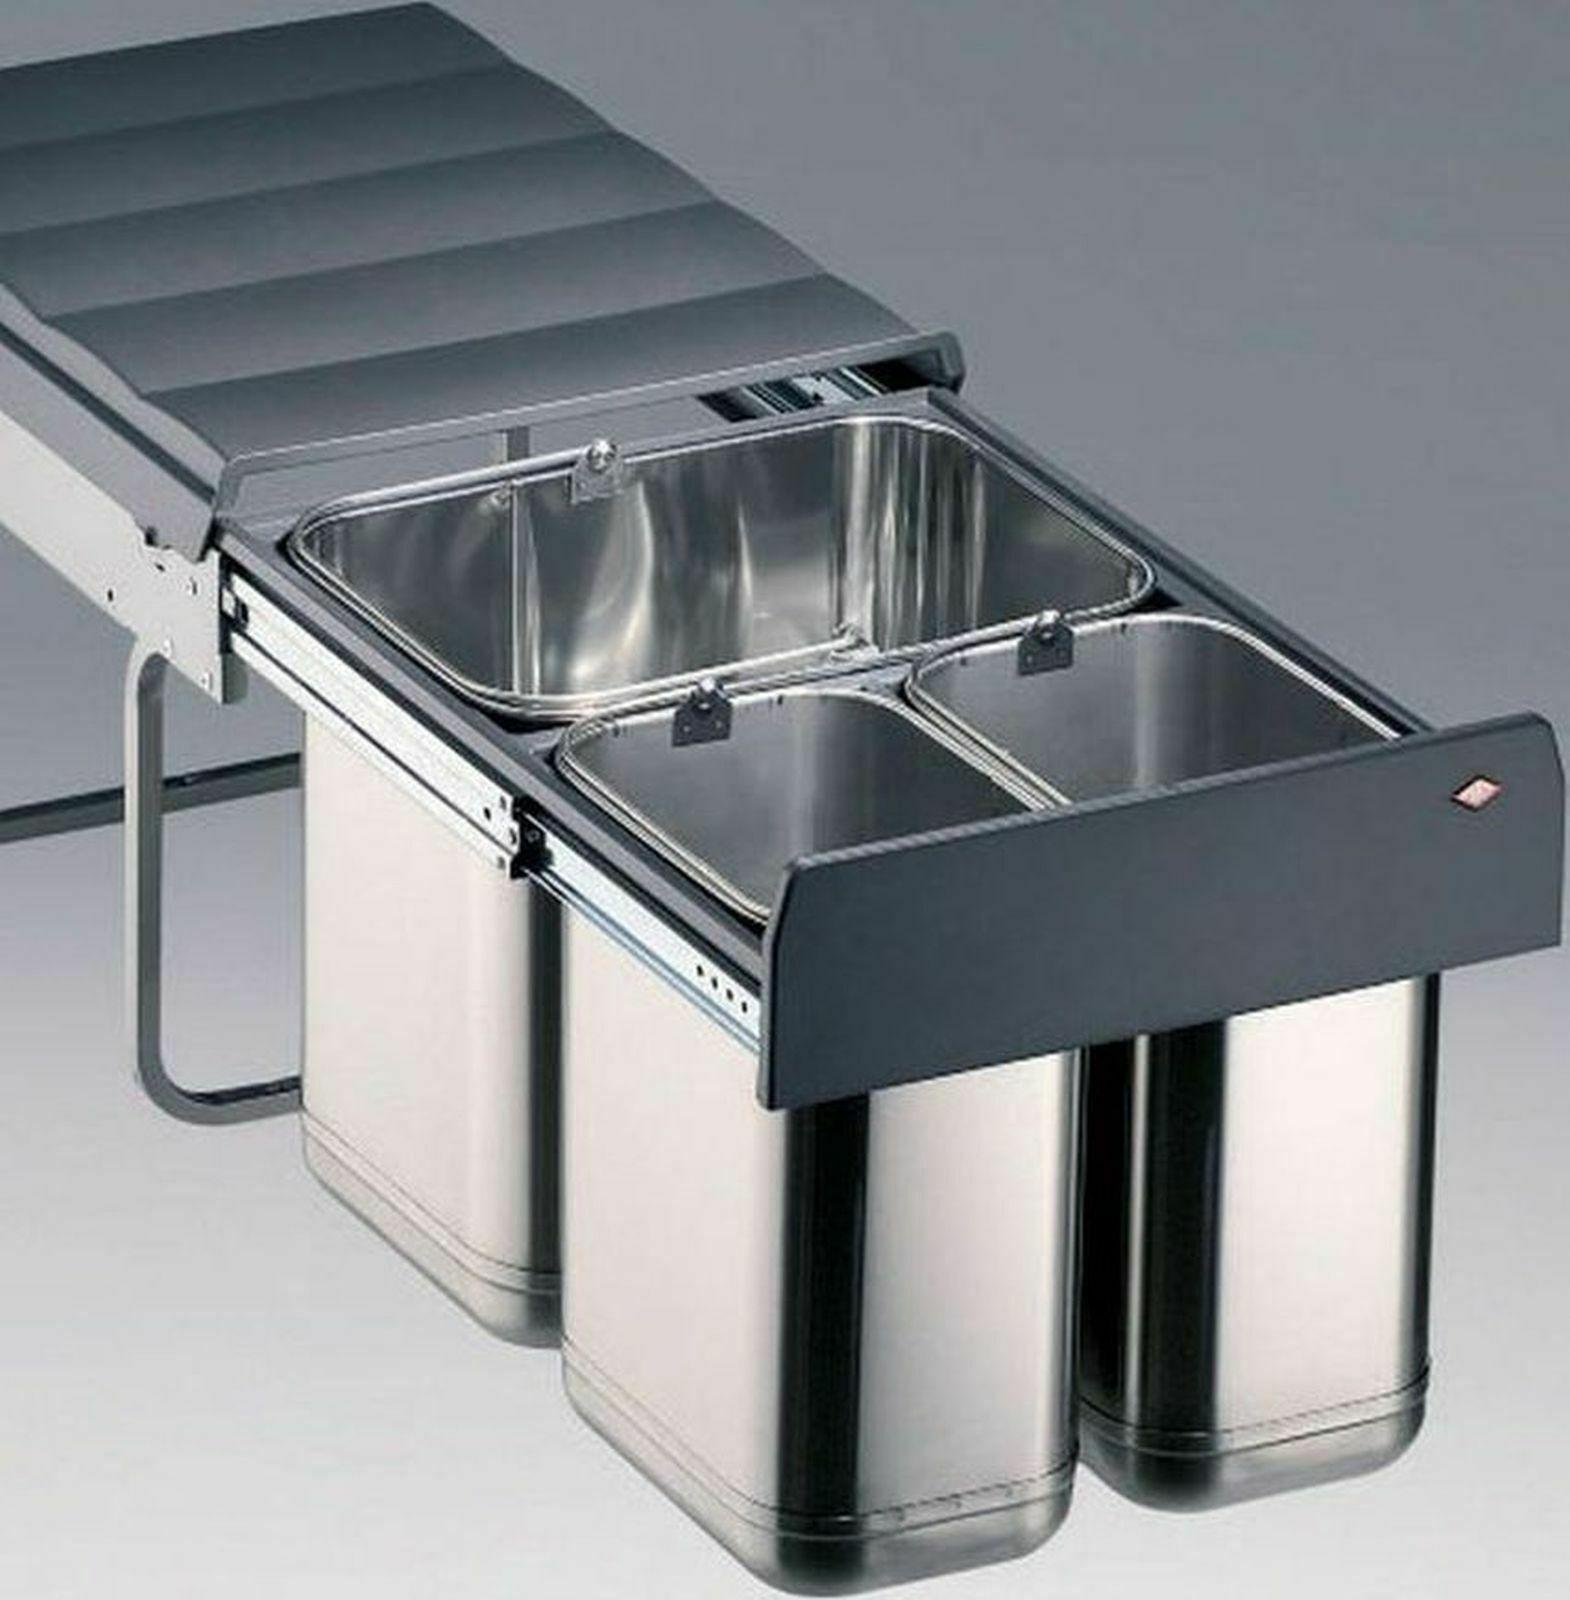 Küchen Einbau-Mülleimer 32 L Edelstahl Abfalleimer Wesco Mülltrennsystem  *515462